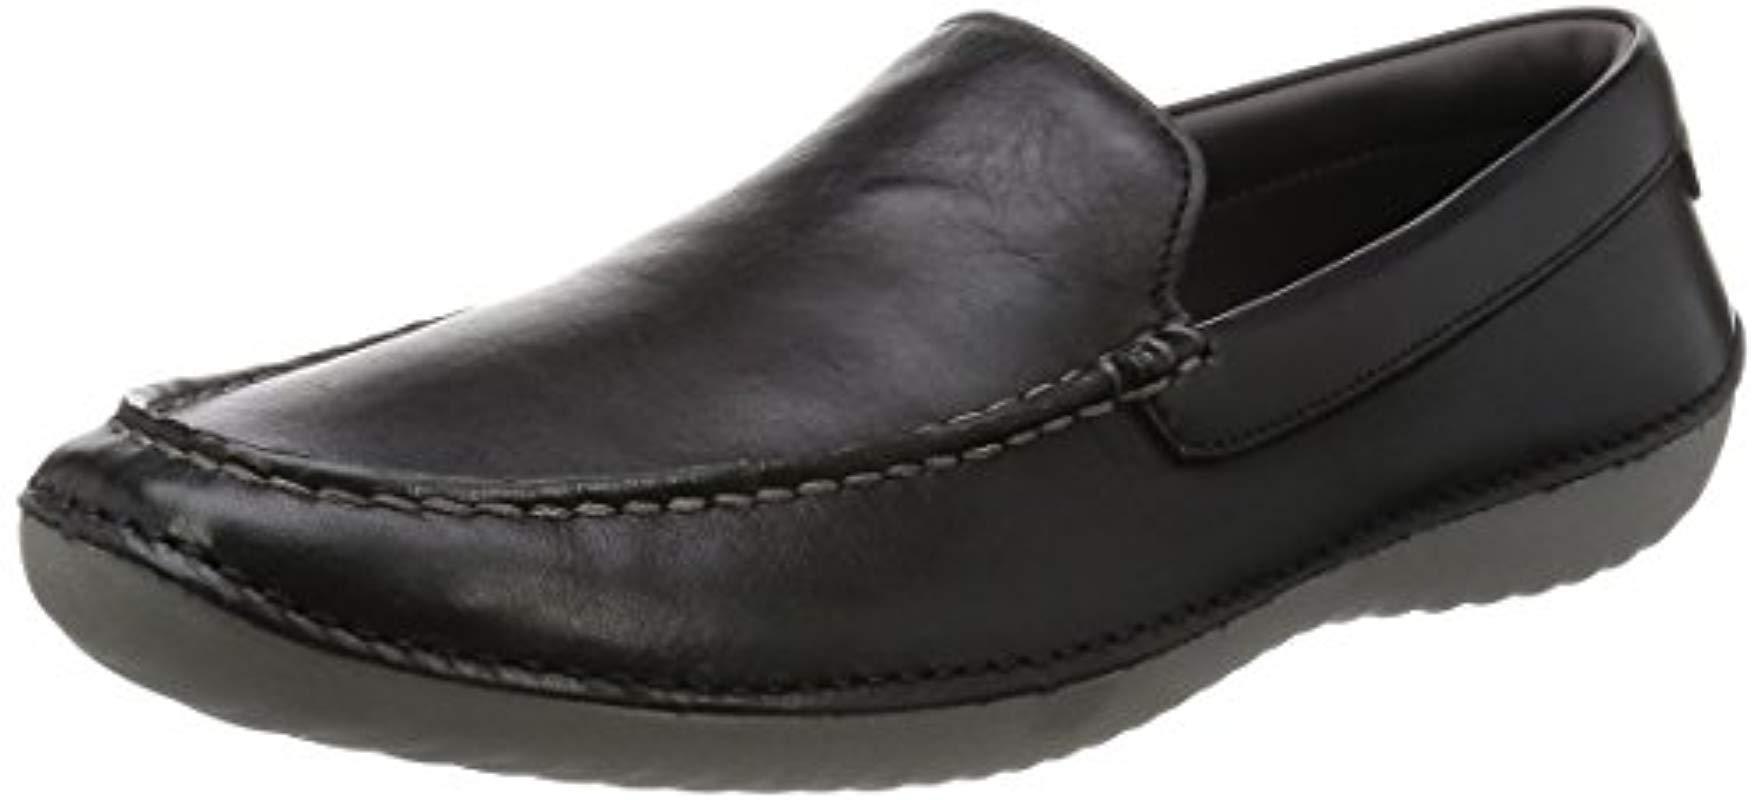 5f497b0c3b0 Lyst - Cole Haan Motogrand Roadtrip Venetian Slip-on Loafer in Black ...